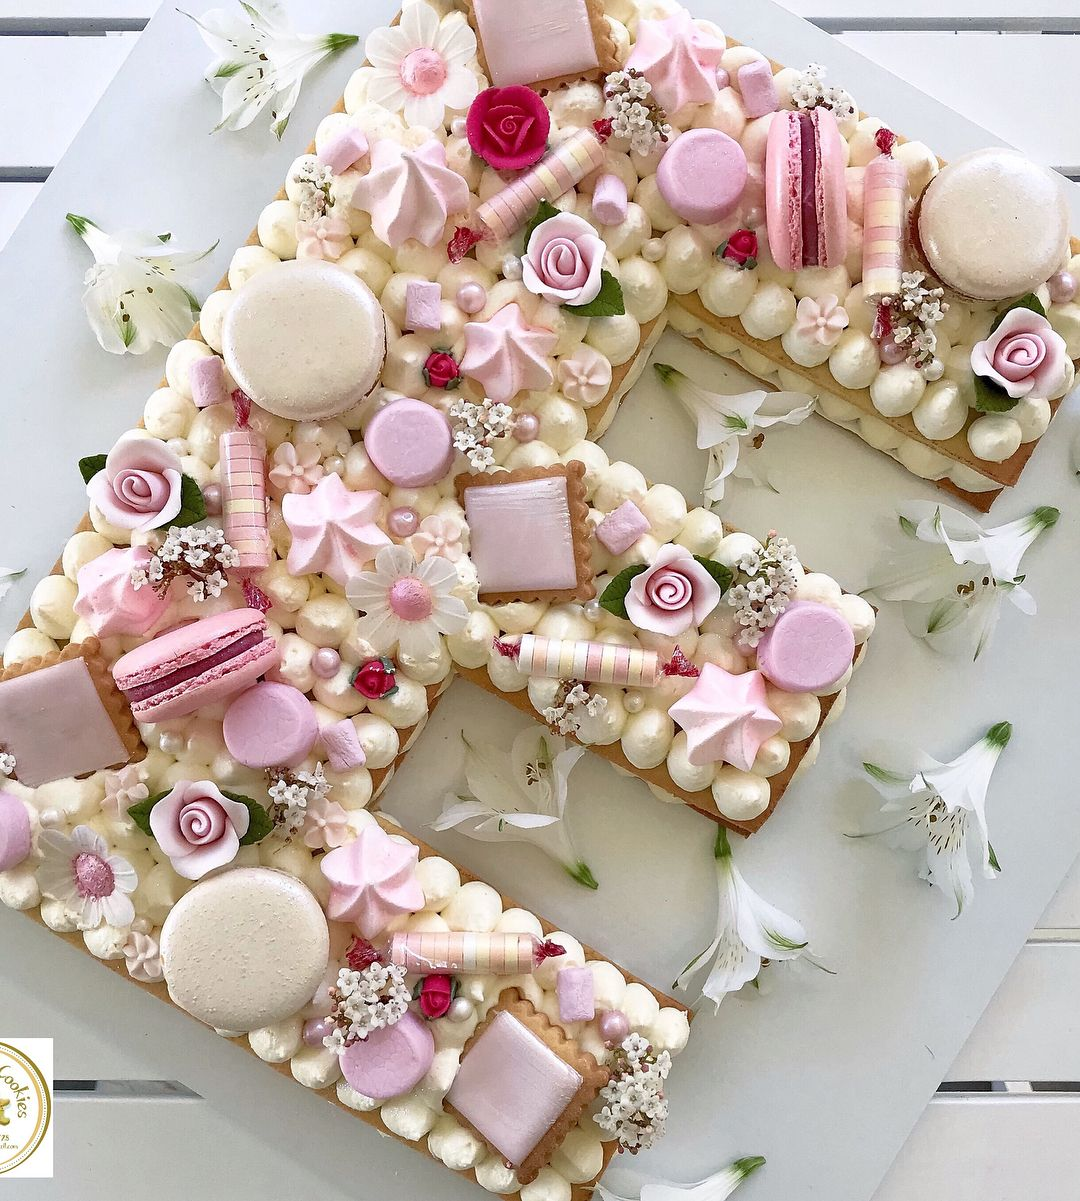 E letter cookie cake🌹🍰🍪 #cookiecake #biscocake #sydneyevents   Cake  lettering, Alphabet cake, Cookie cake